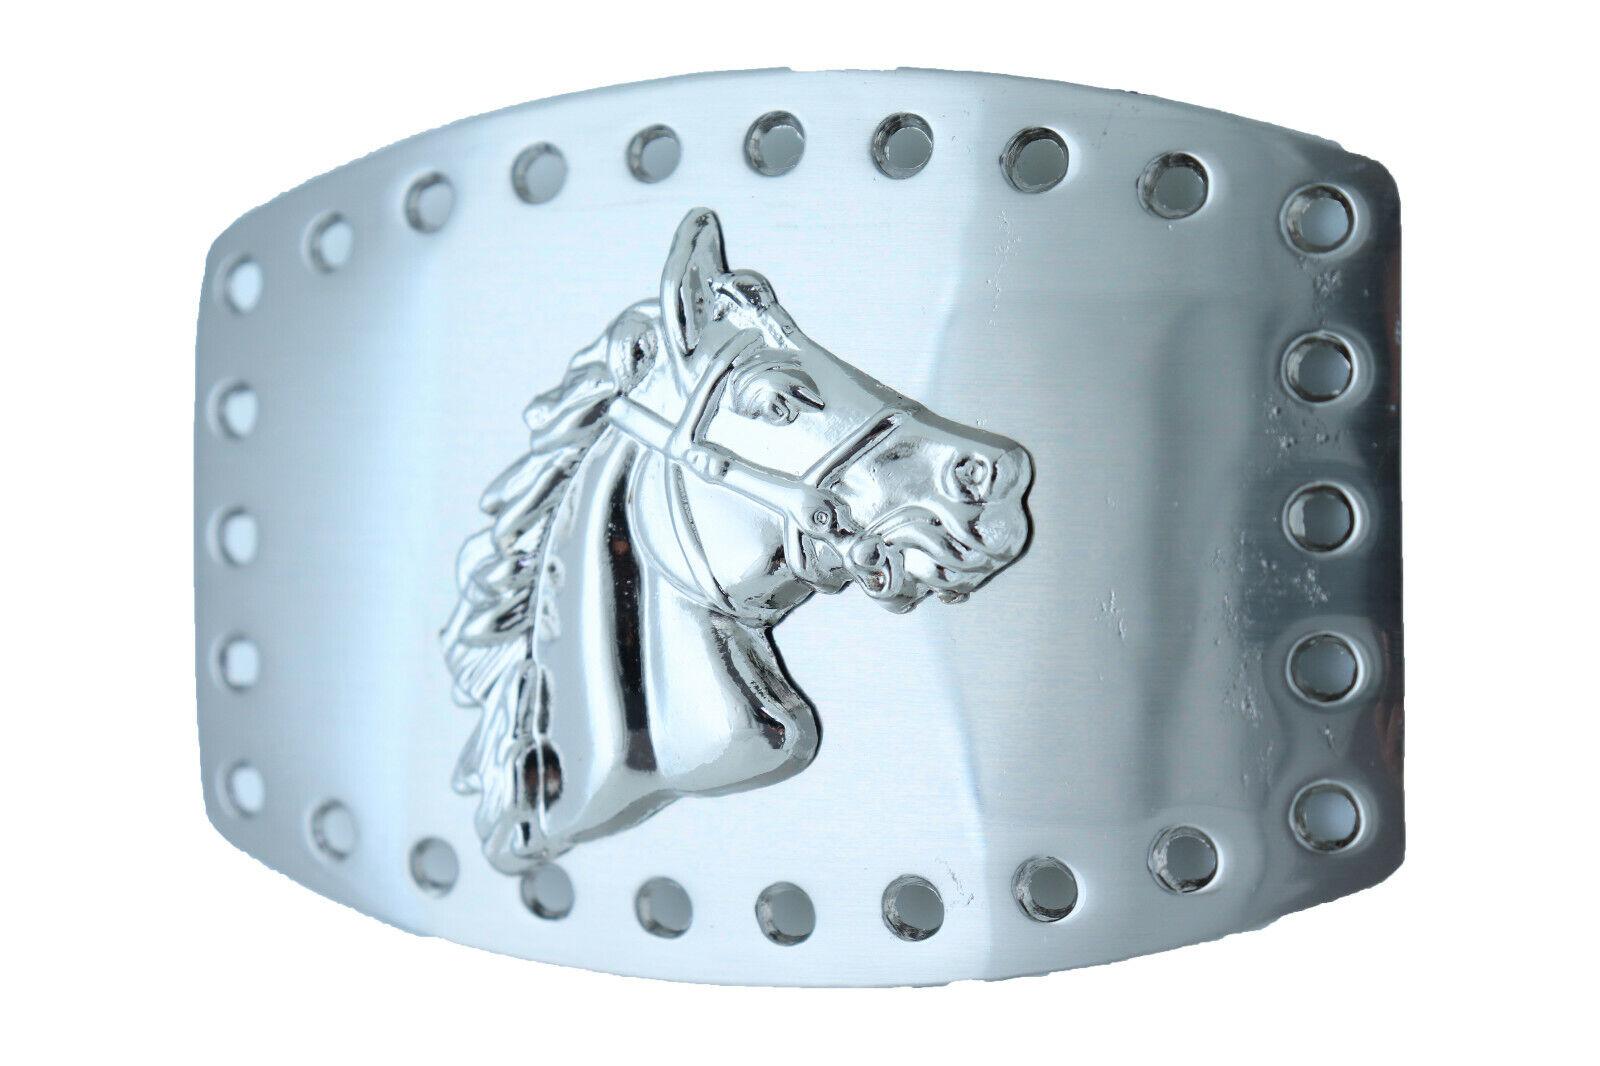 Herren Damen Western Mode Gürtelschnalle Silber Metal Rodeo Pferd Tier Land